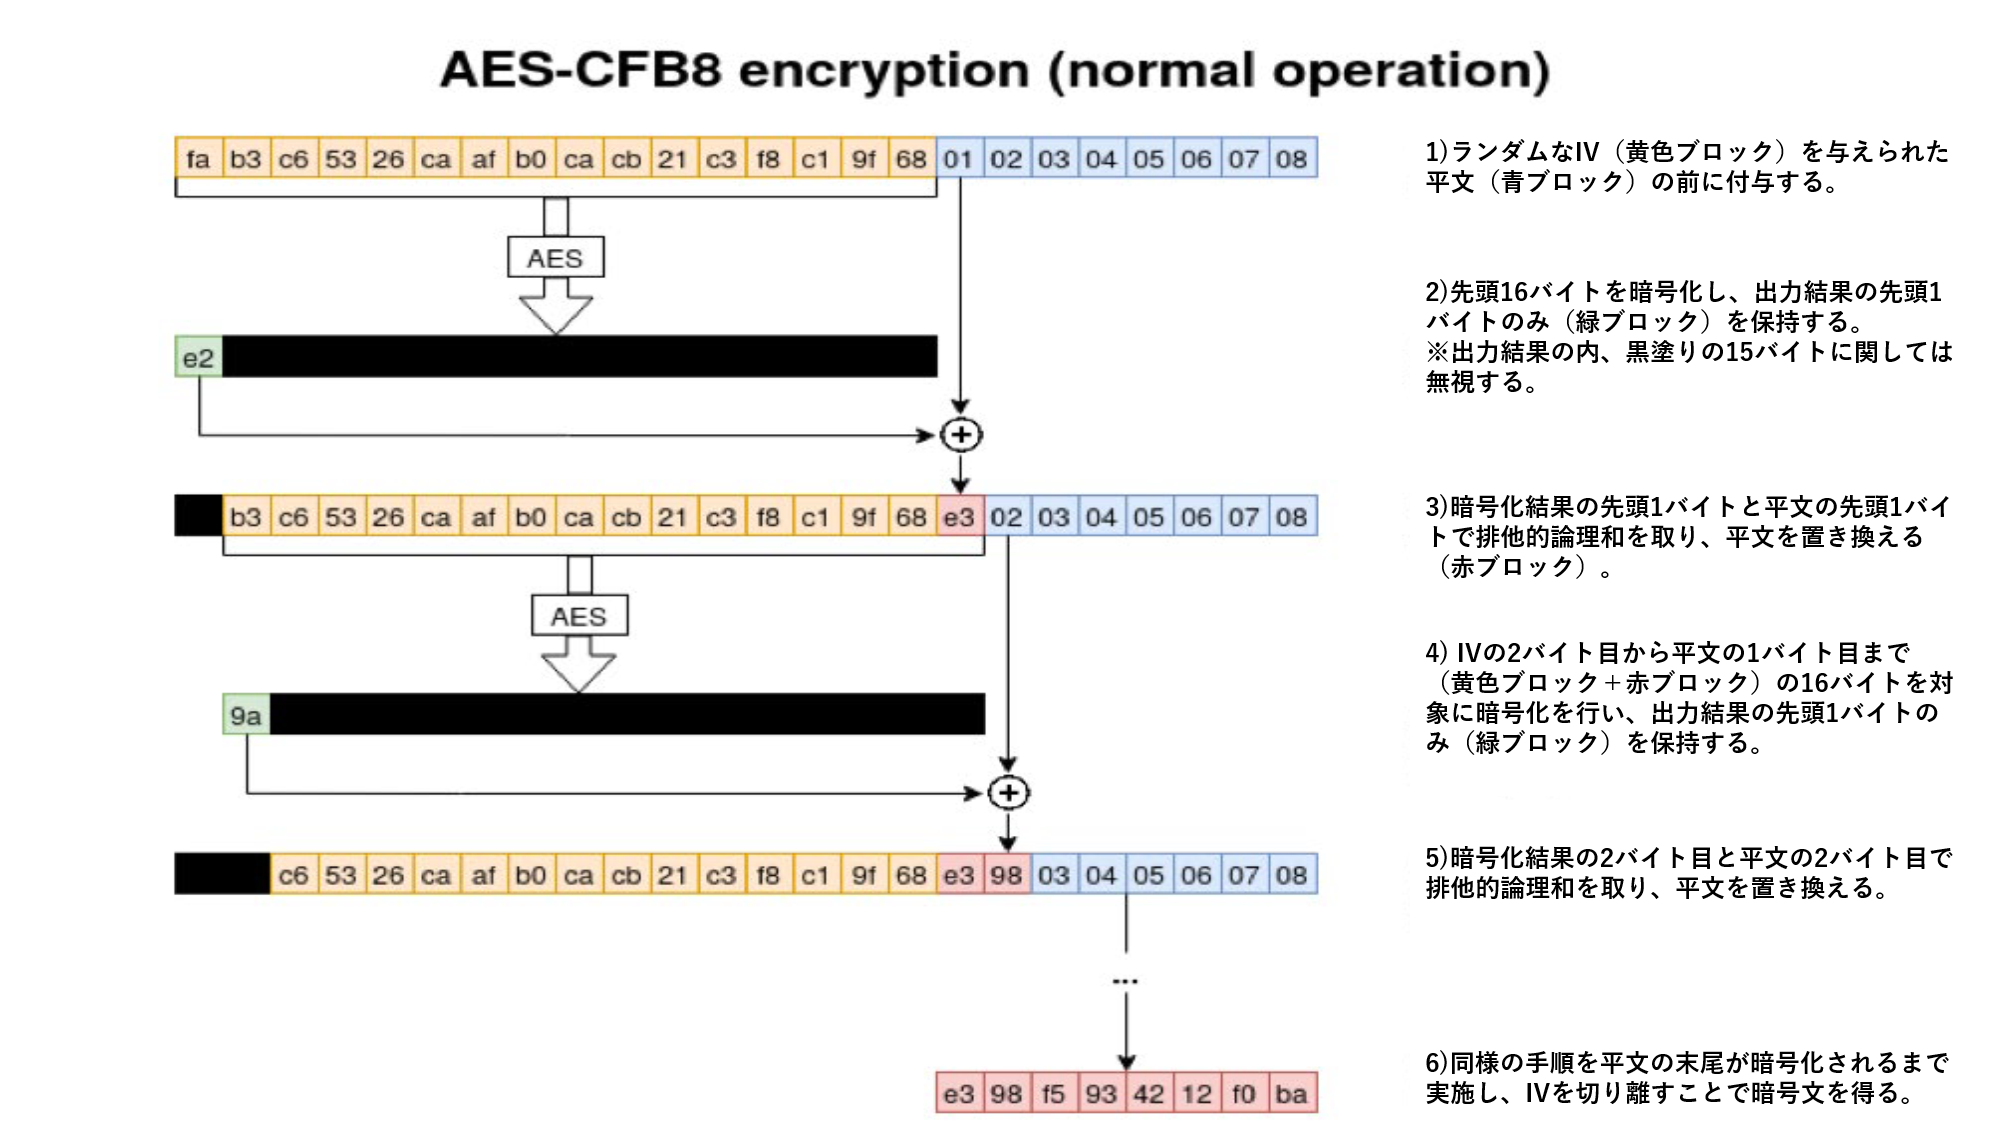 SecureSketCH_AES-CFBencryption_normal